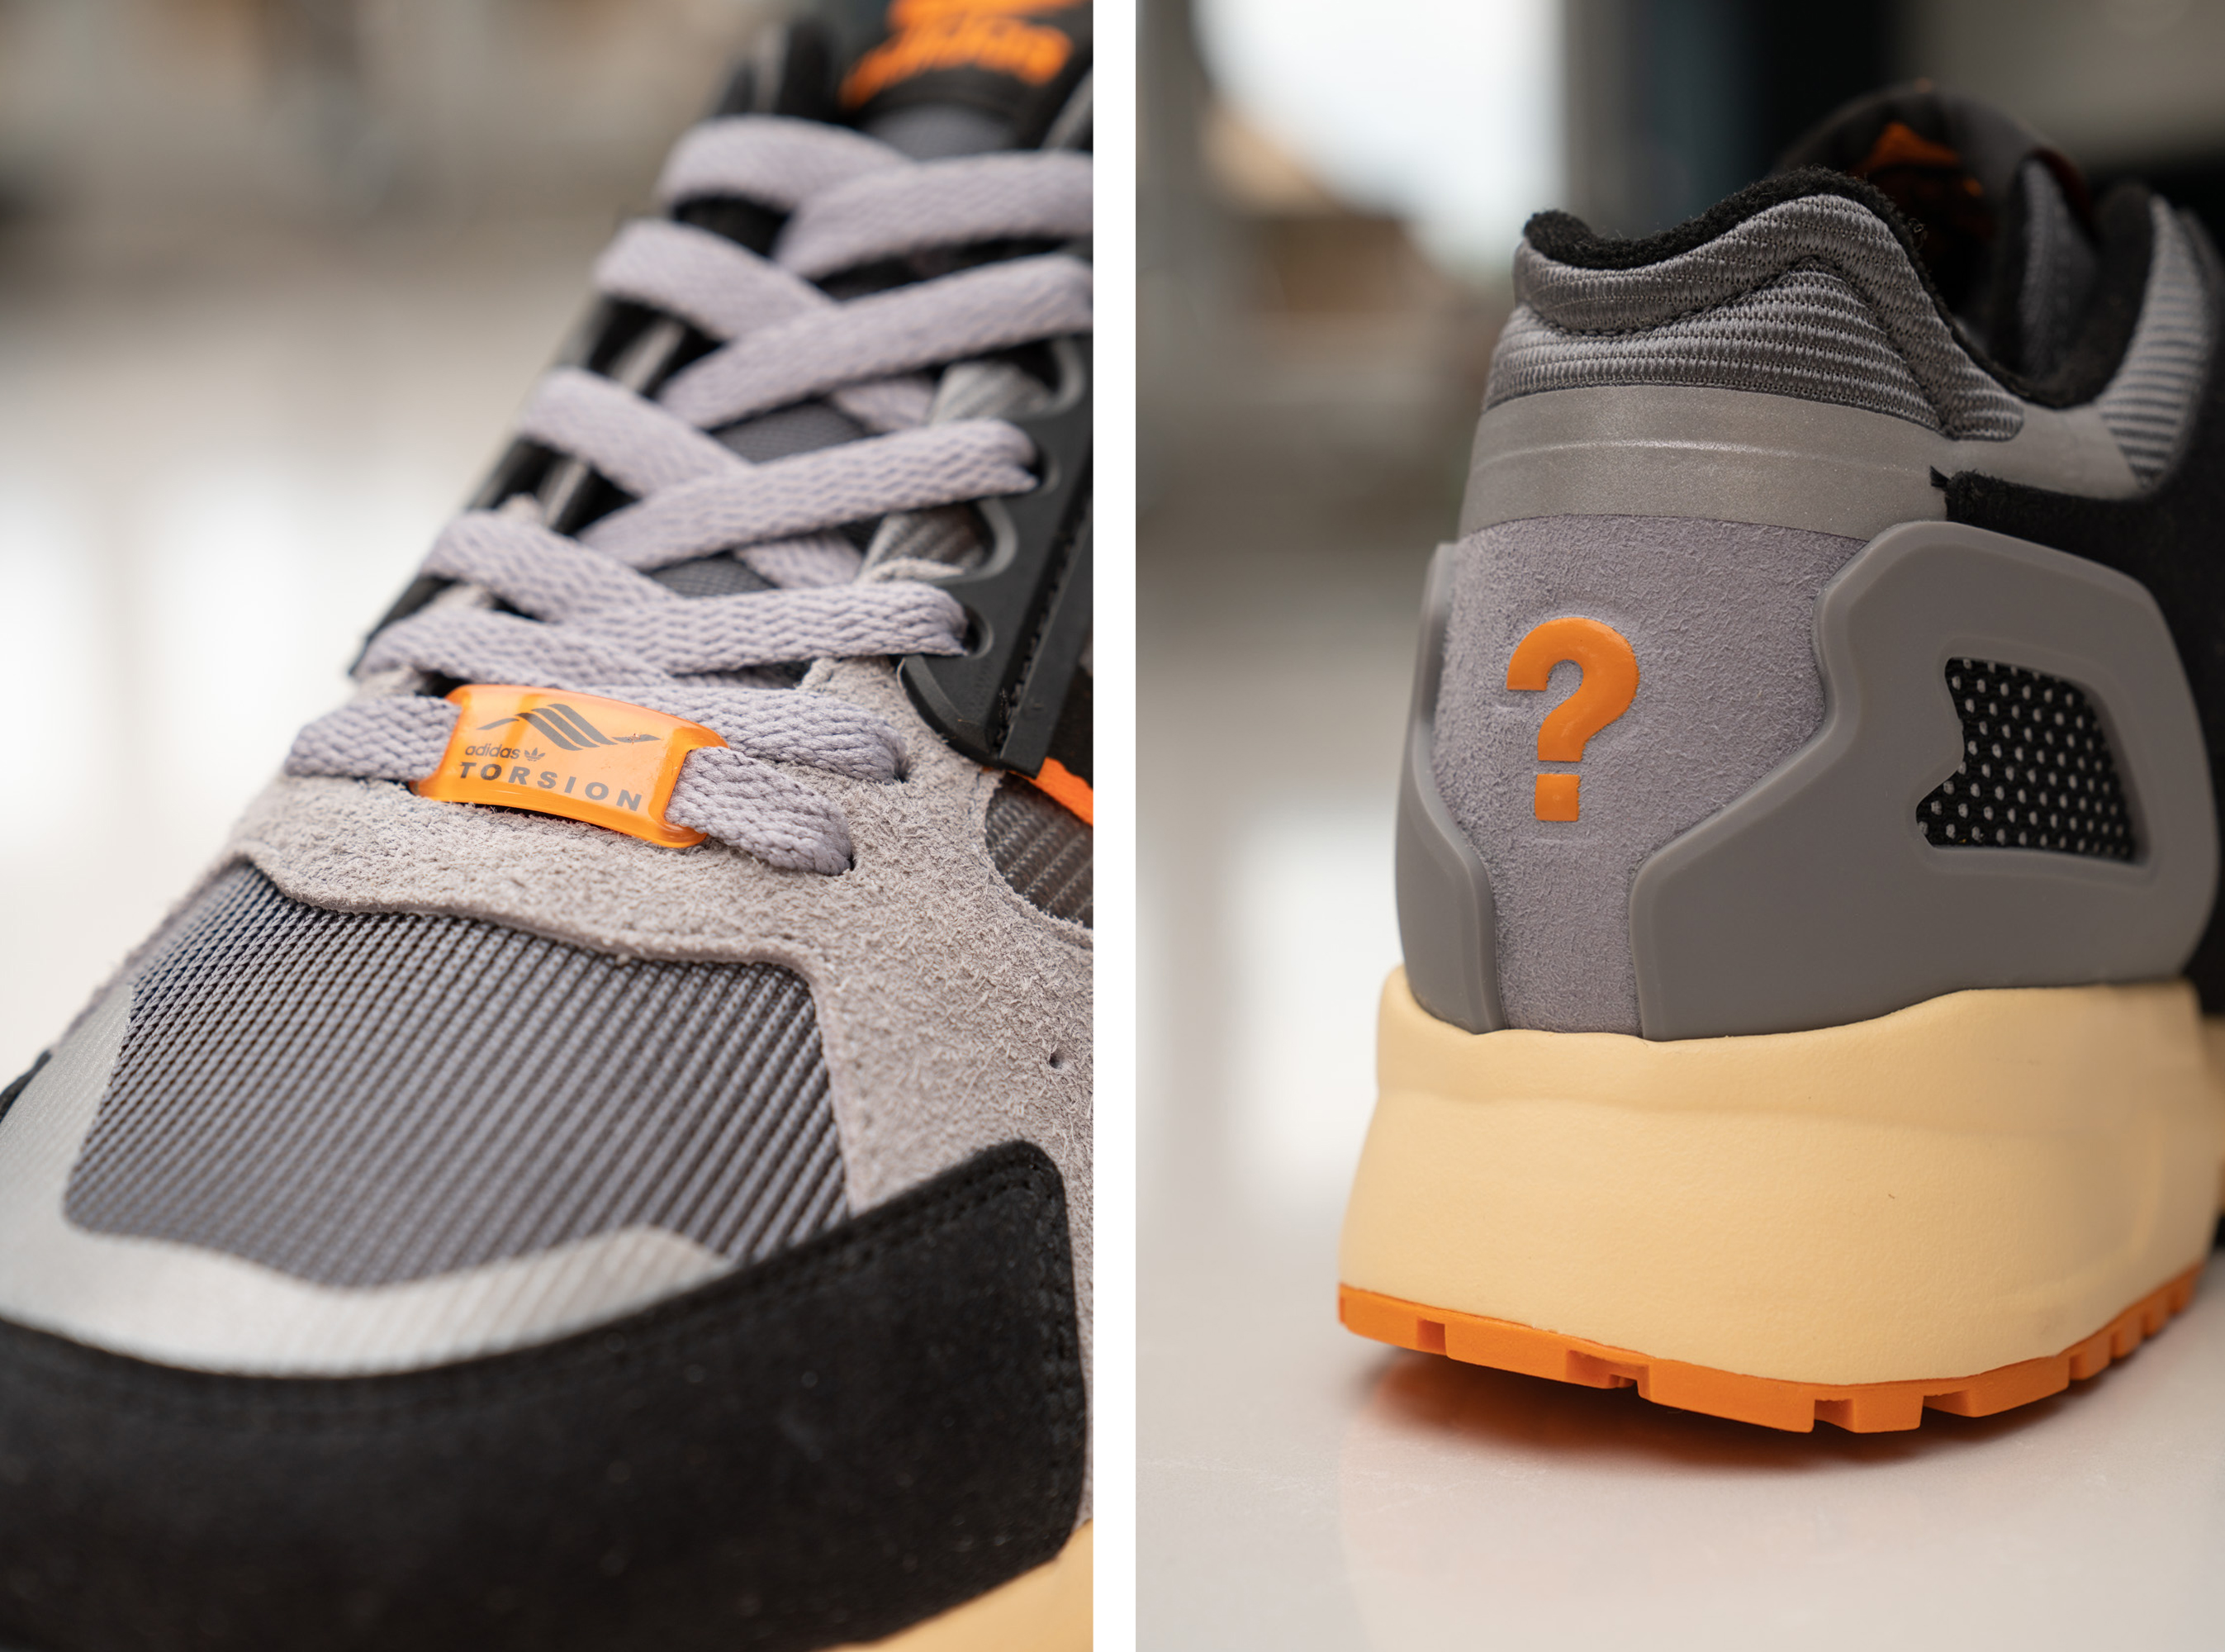 golondrina salchicha multa  size? x adidas Originals ZX 10000 C, Nike Air Force 1 Craft and more -  size? previews - July 2020 - size? blog